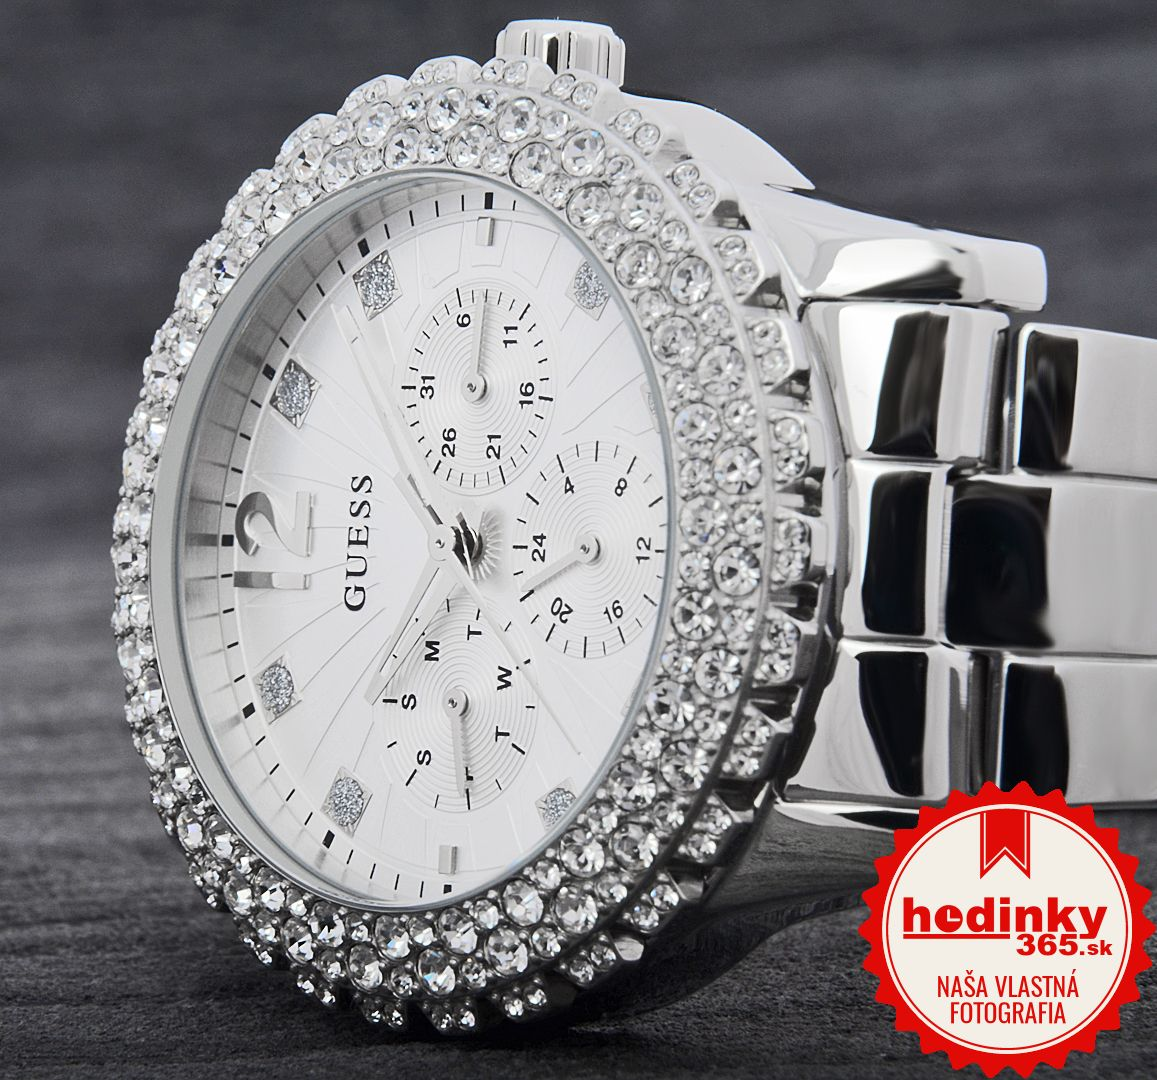 Dámske hodinky - ocelový remienok 3e525664cfe